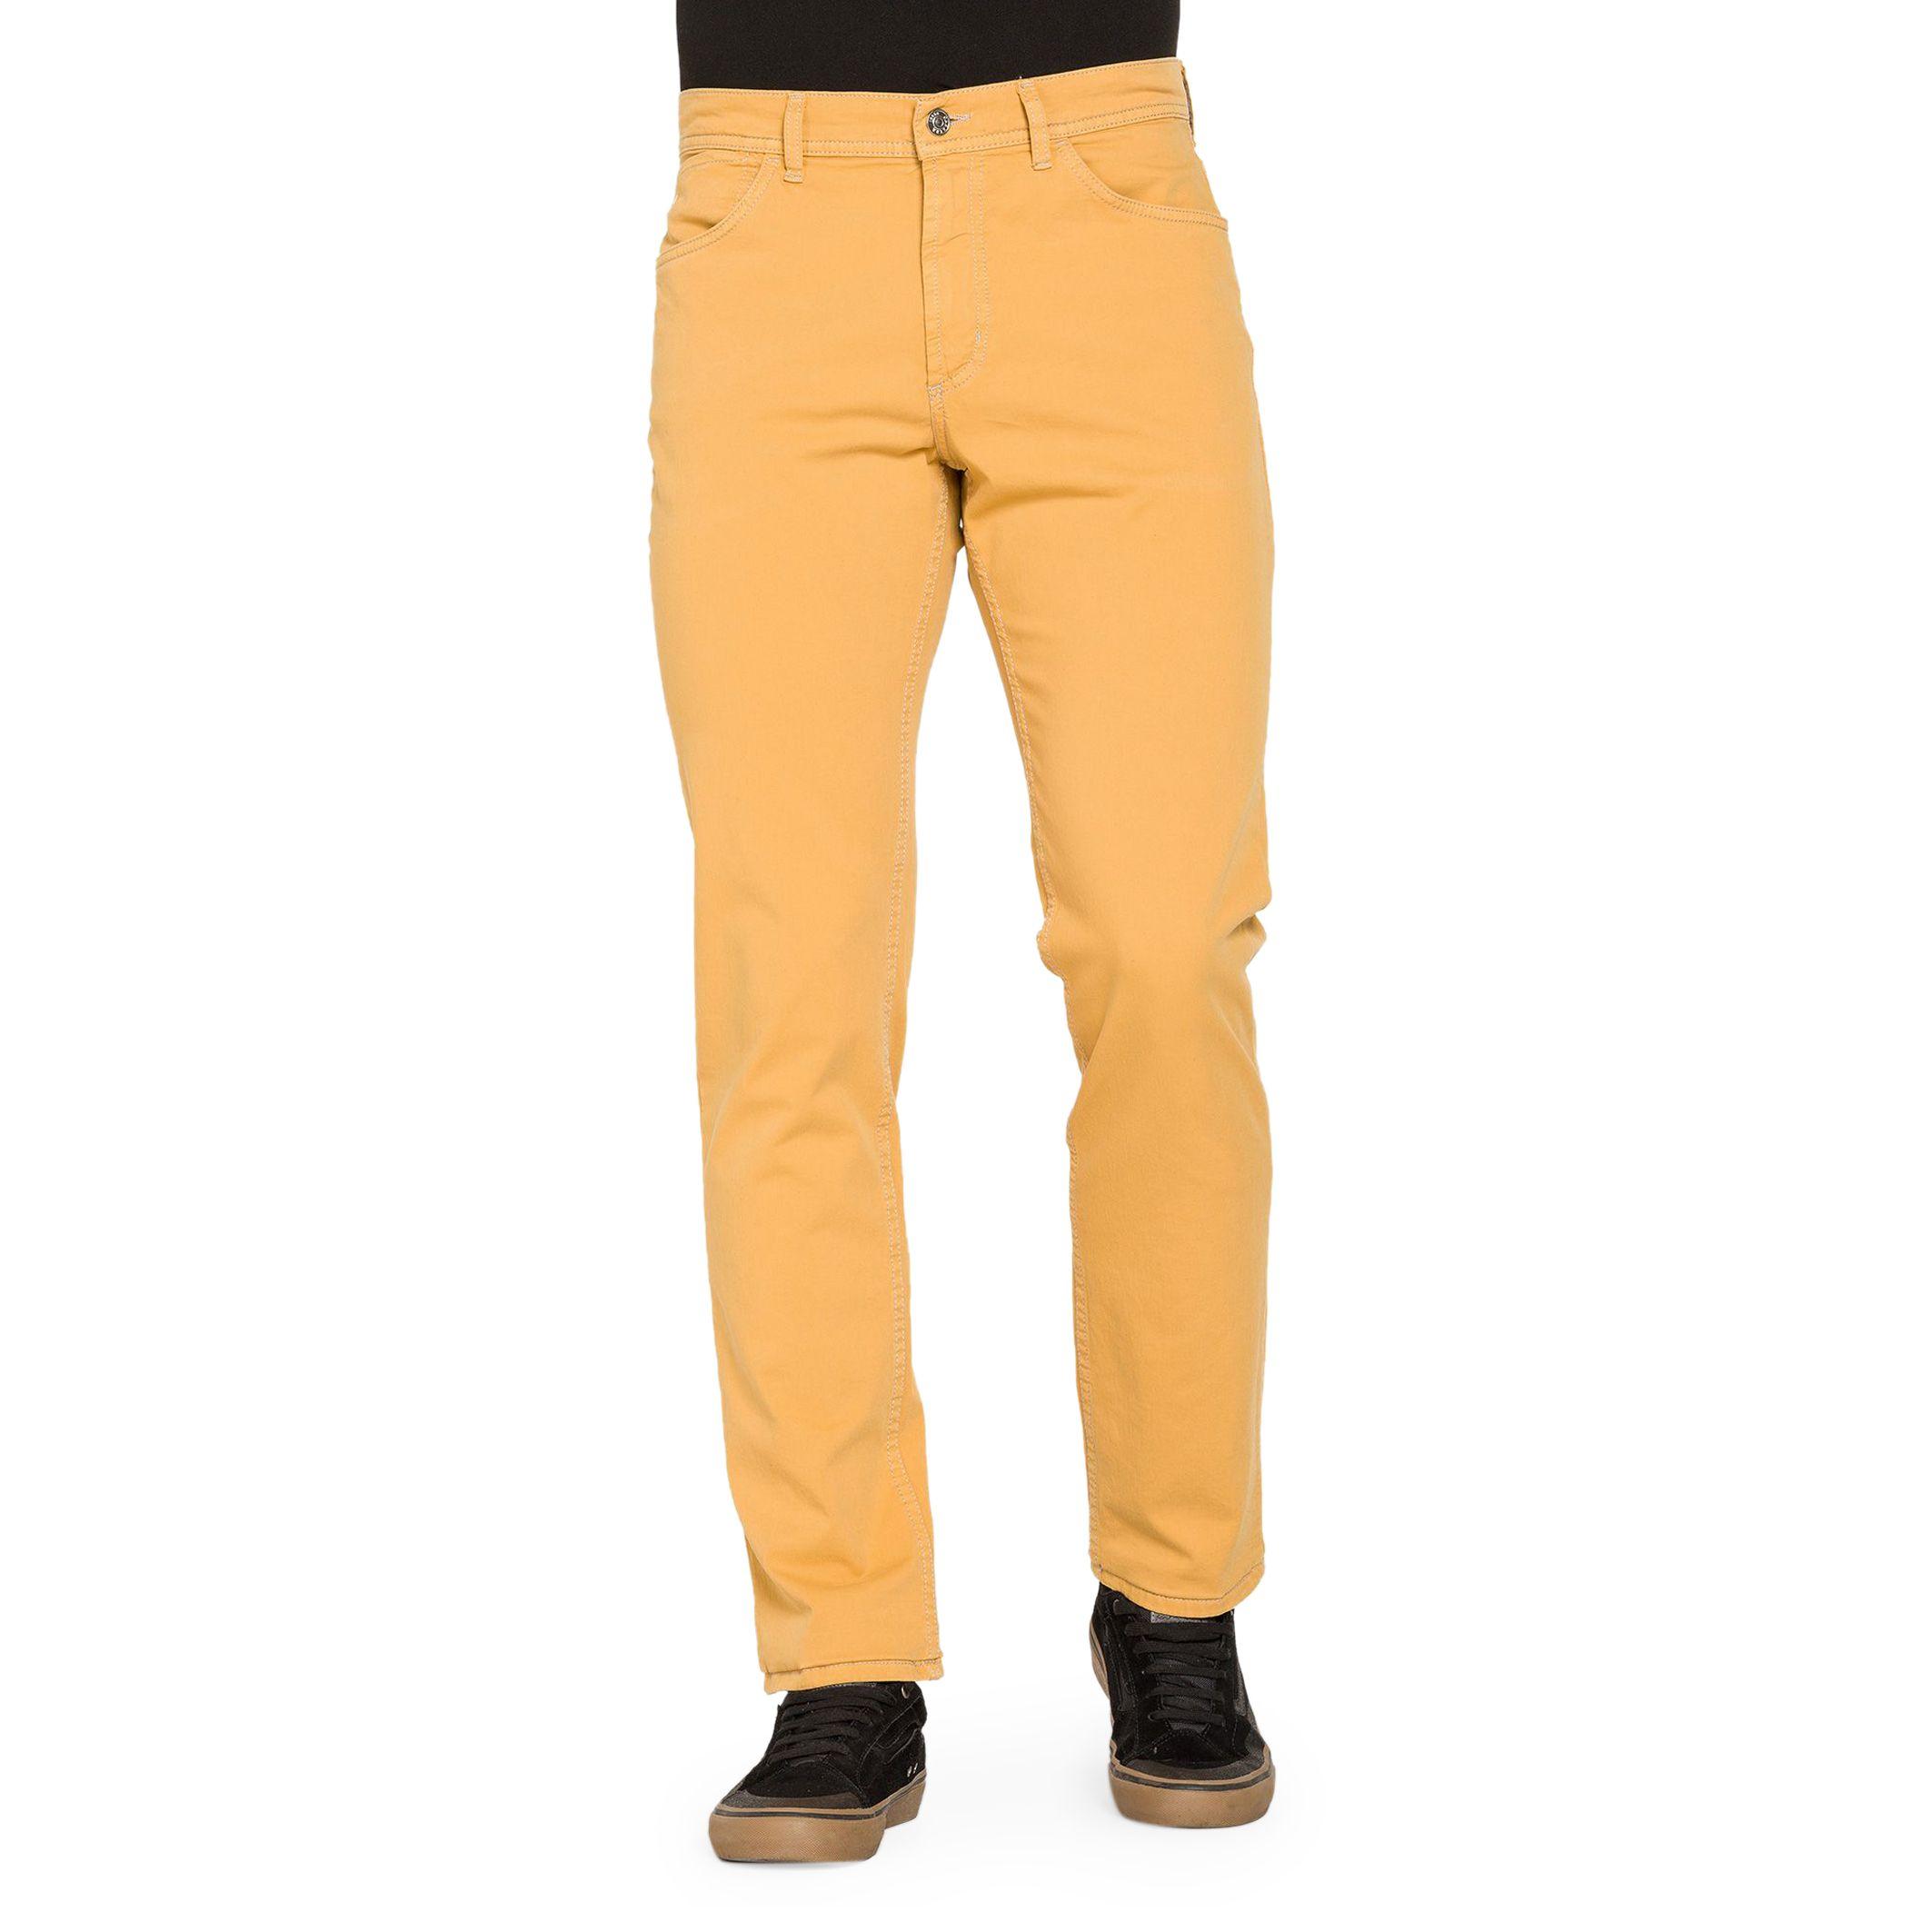 Carrera Jeans - 700-942A